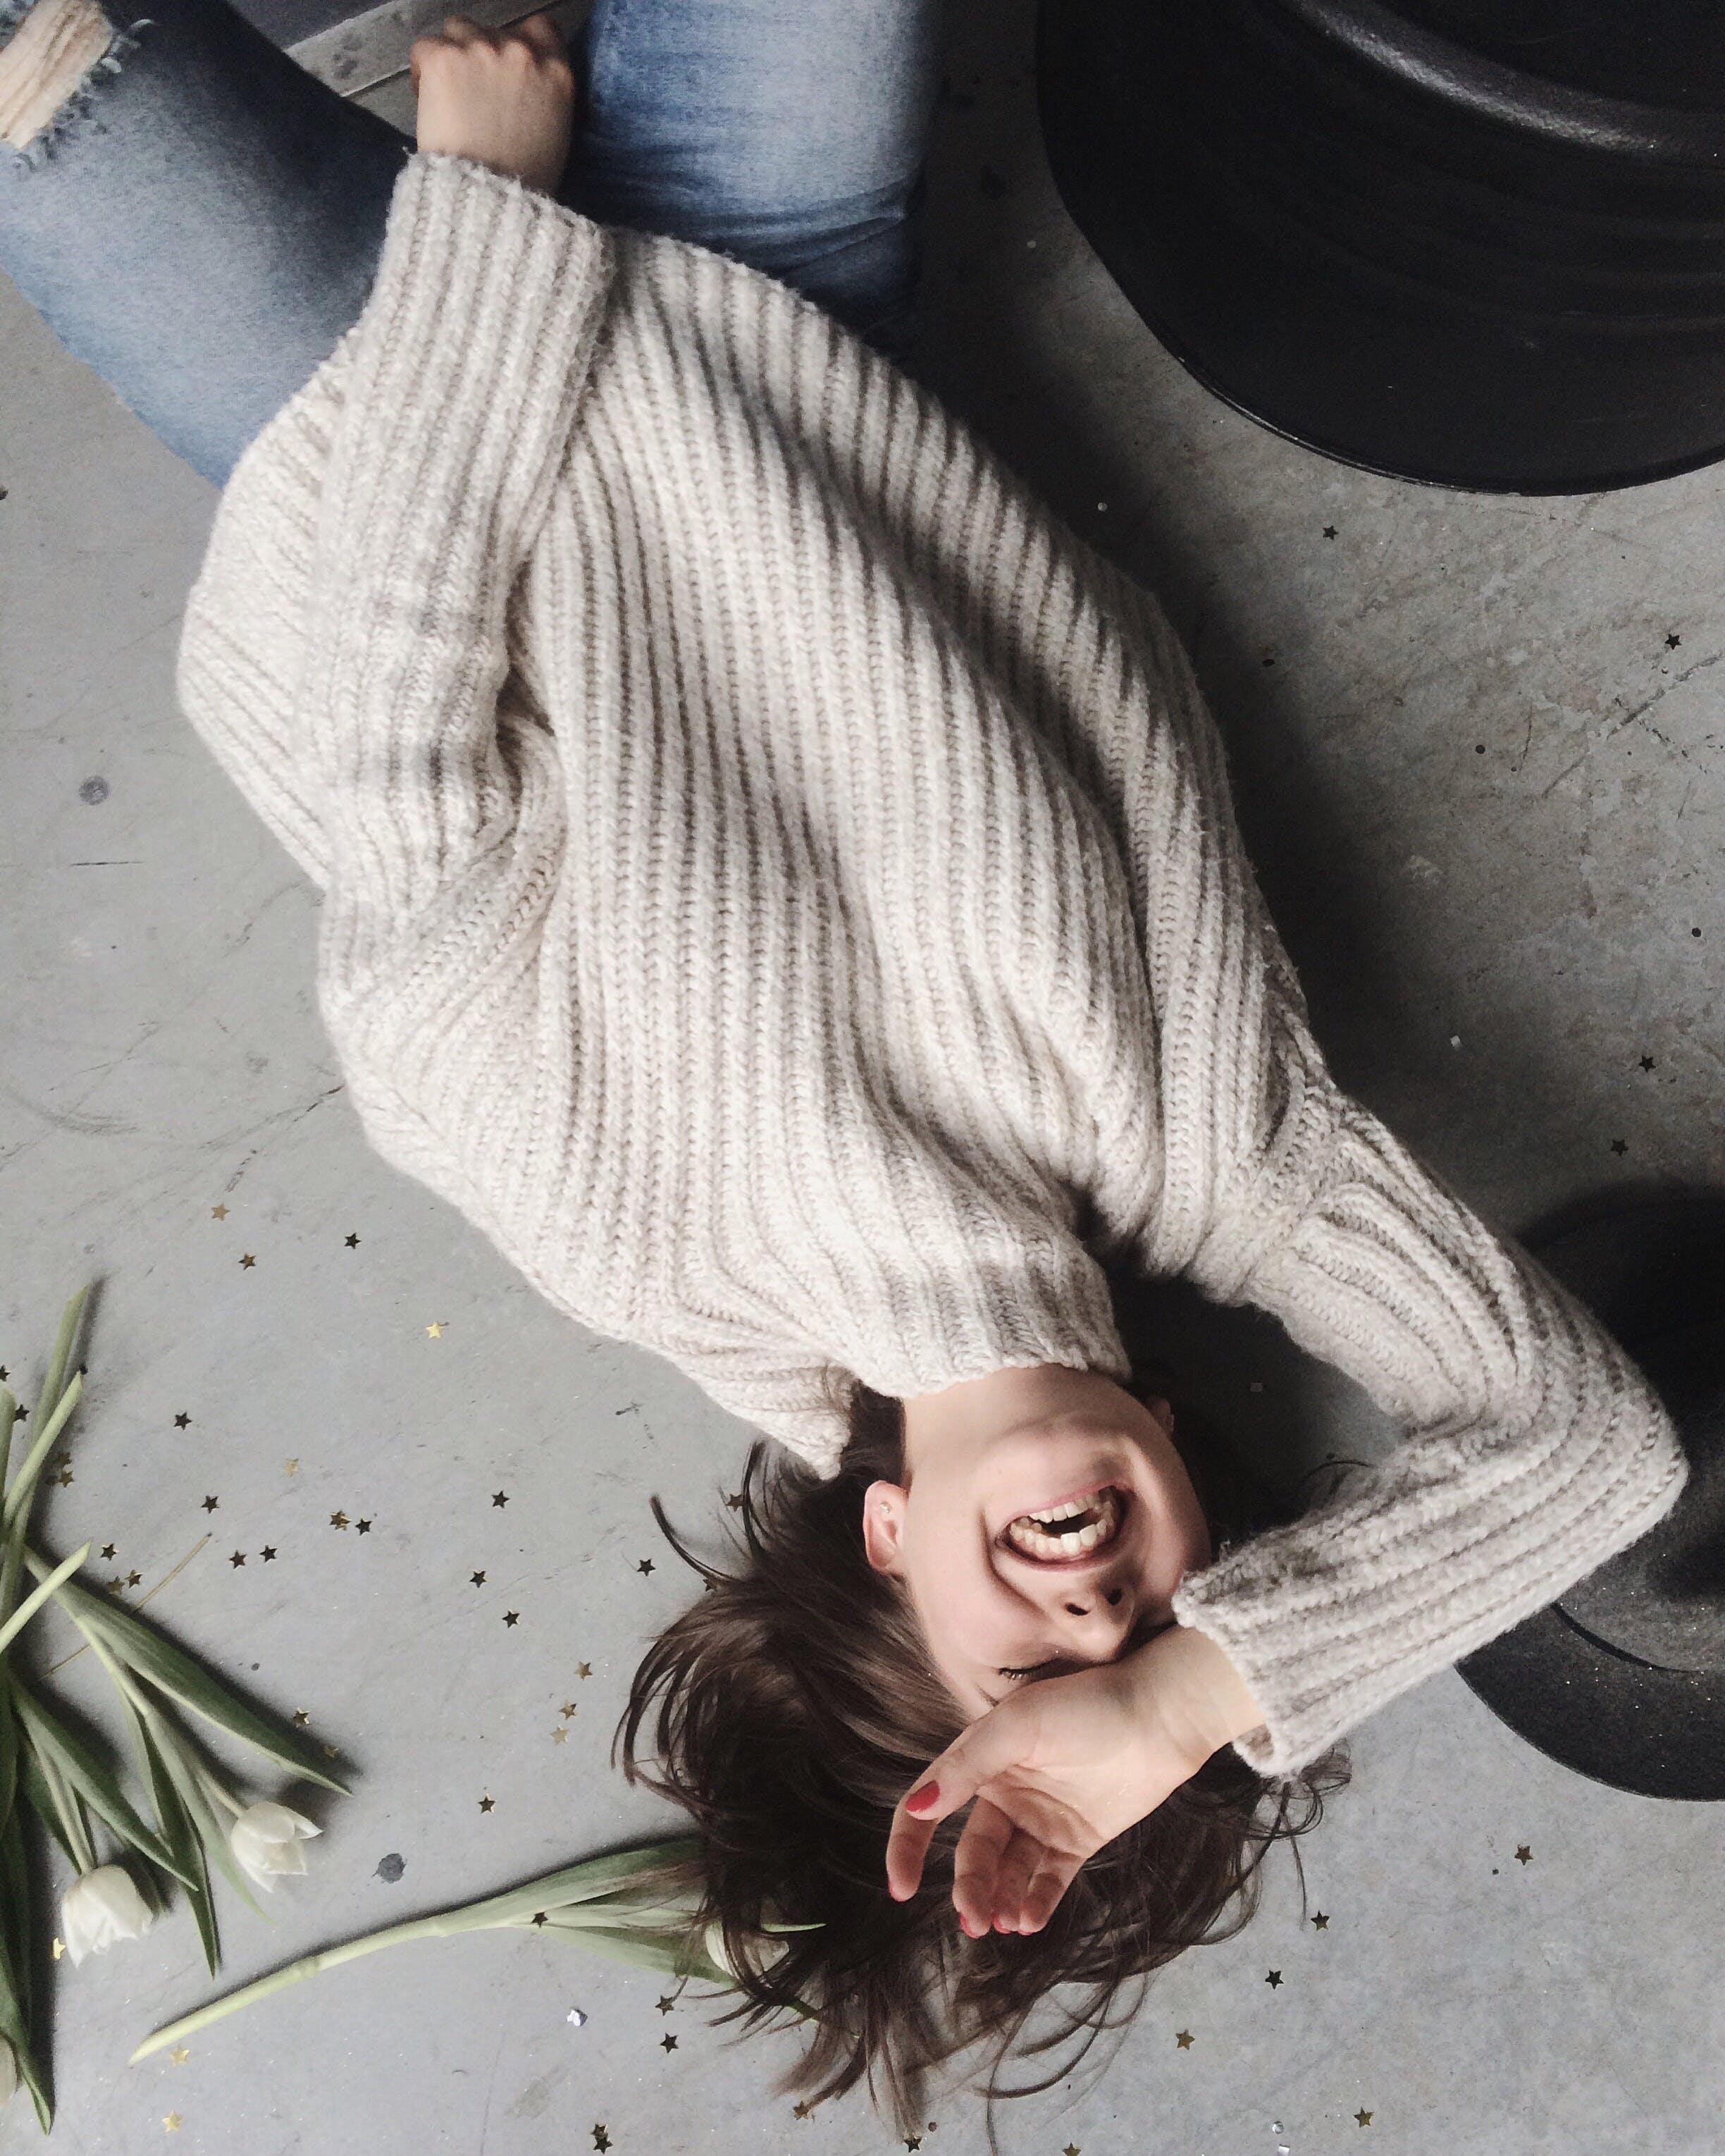 Woman Wearing Gray Sweater Lying on Gray Surface